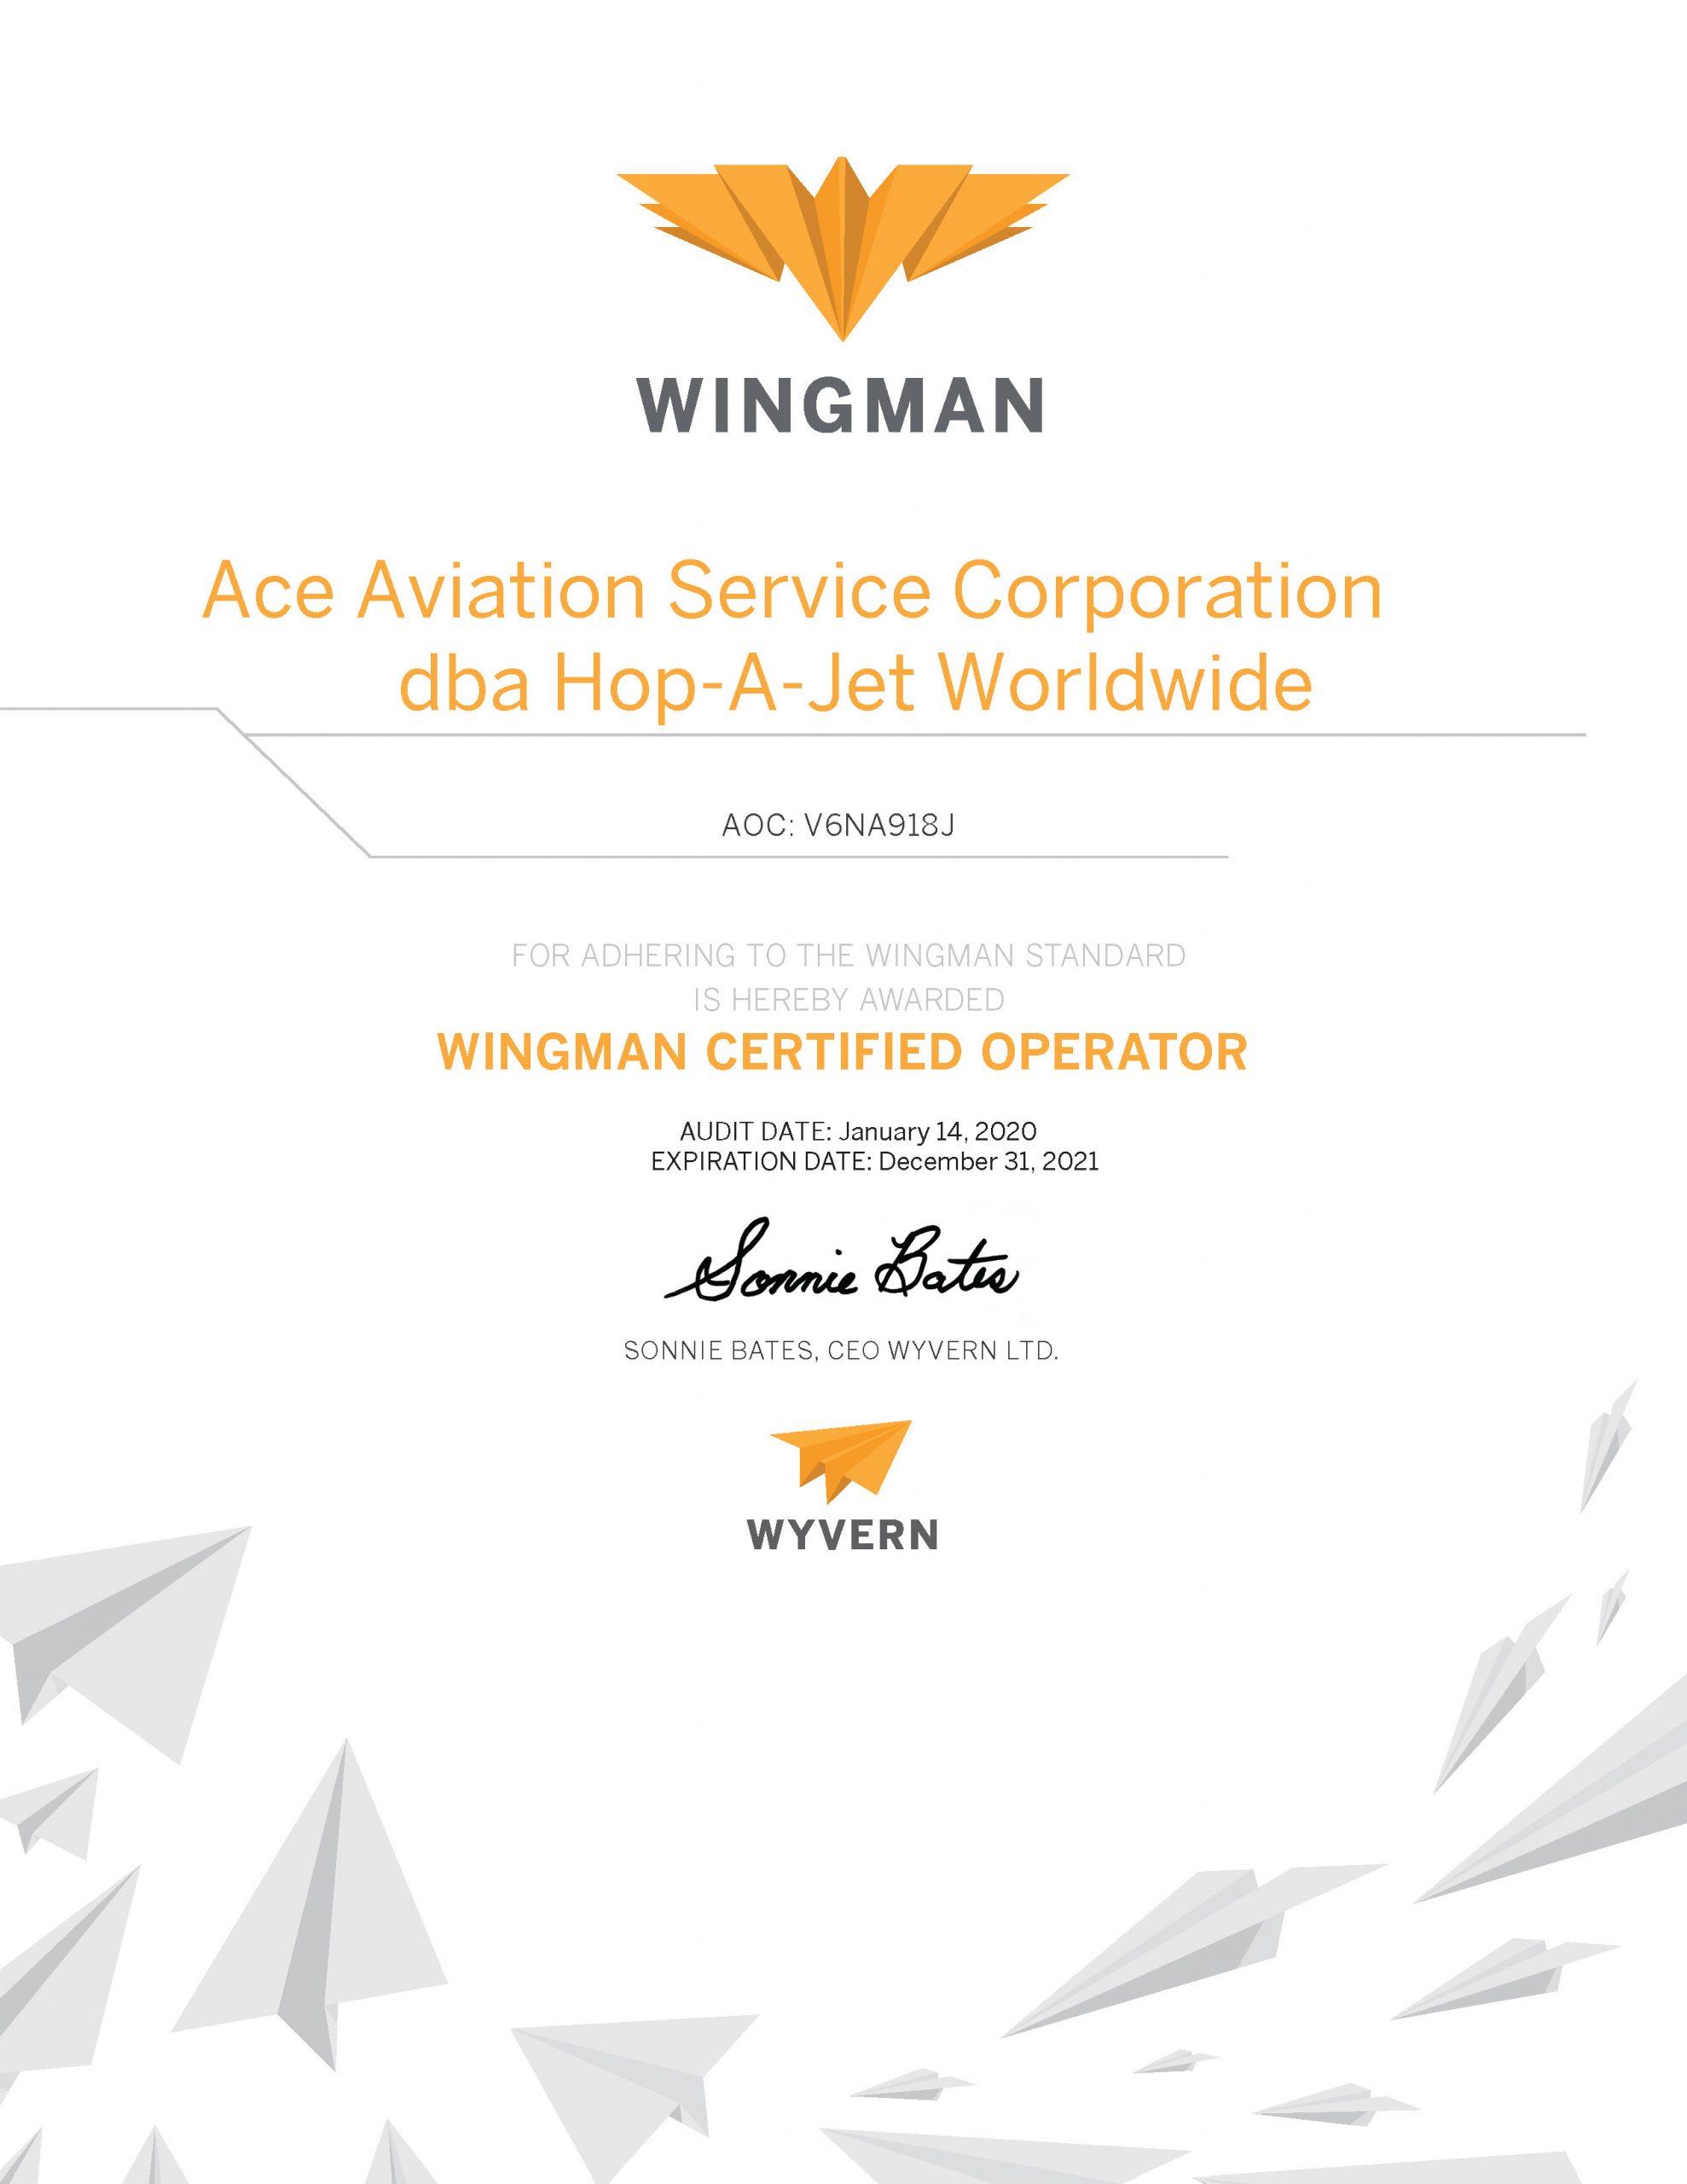 Wingman Certificate